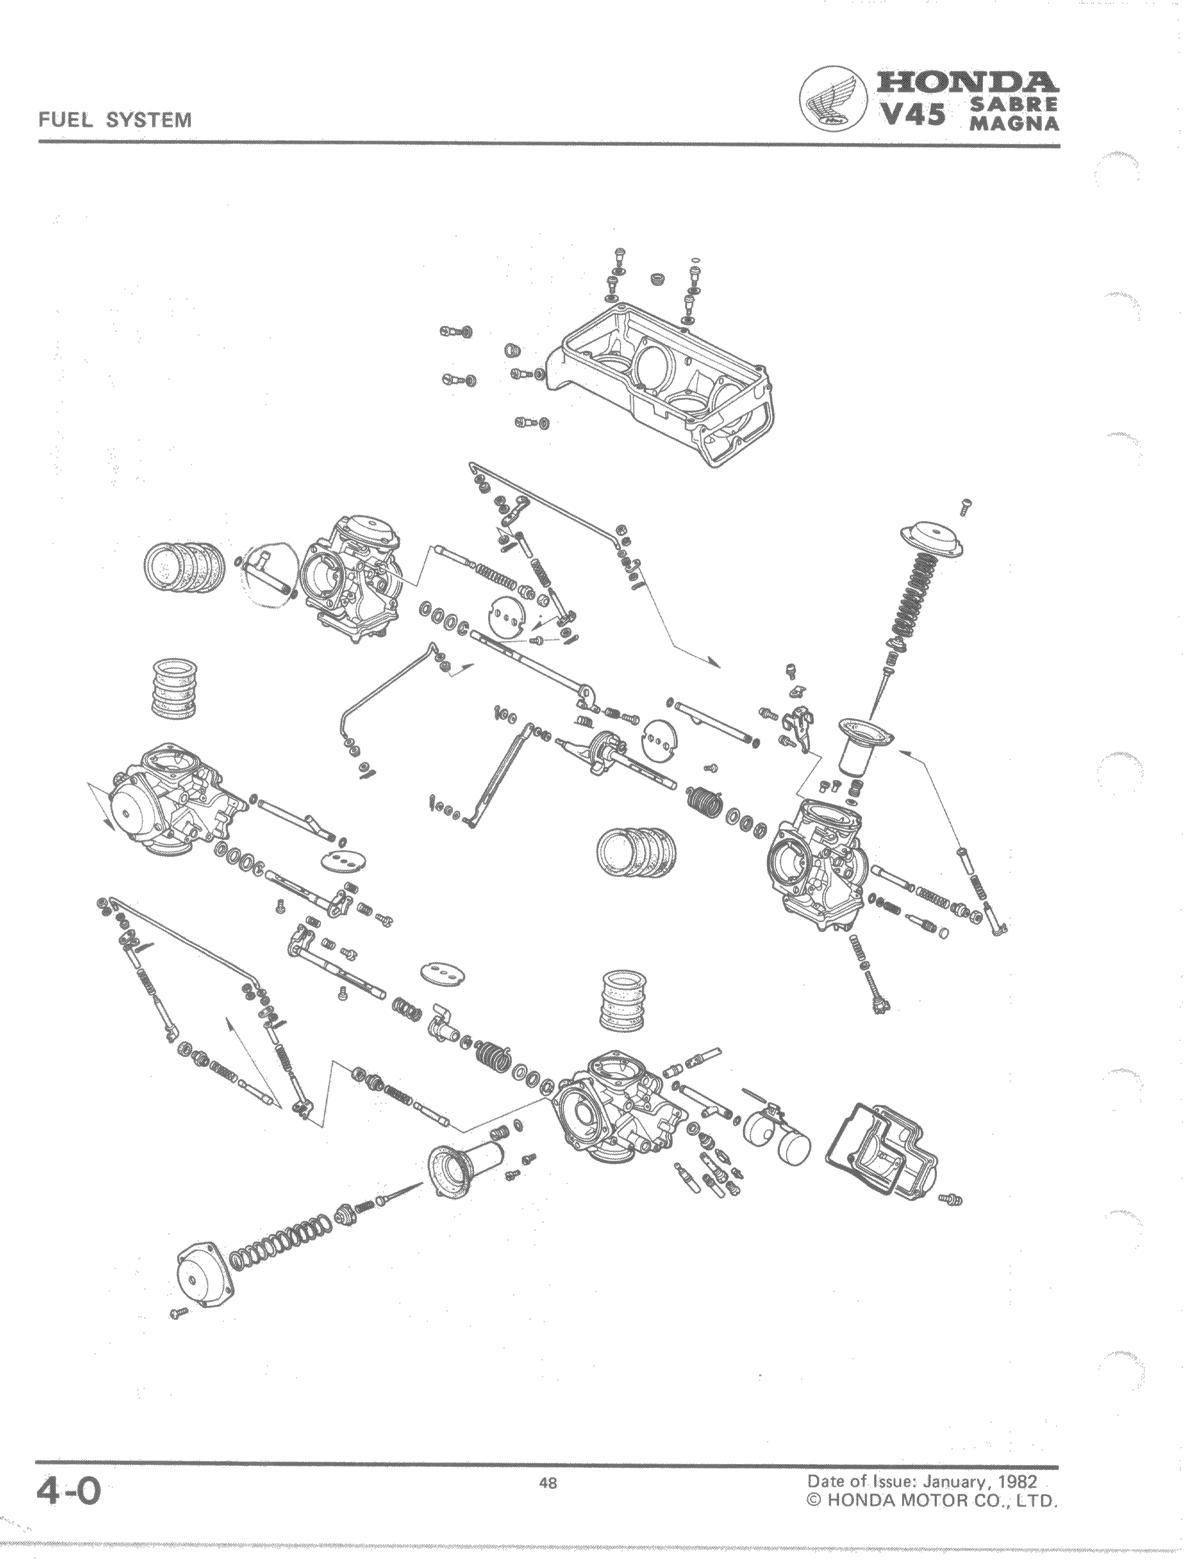 Av 3819  L175 Kubota Tractor Wiring Diagram Download Diagram